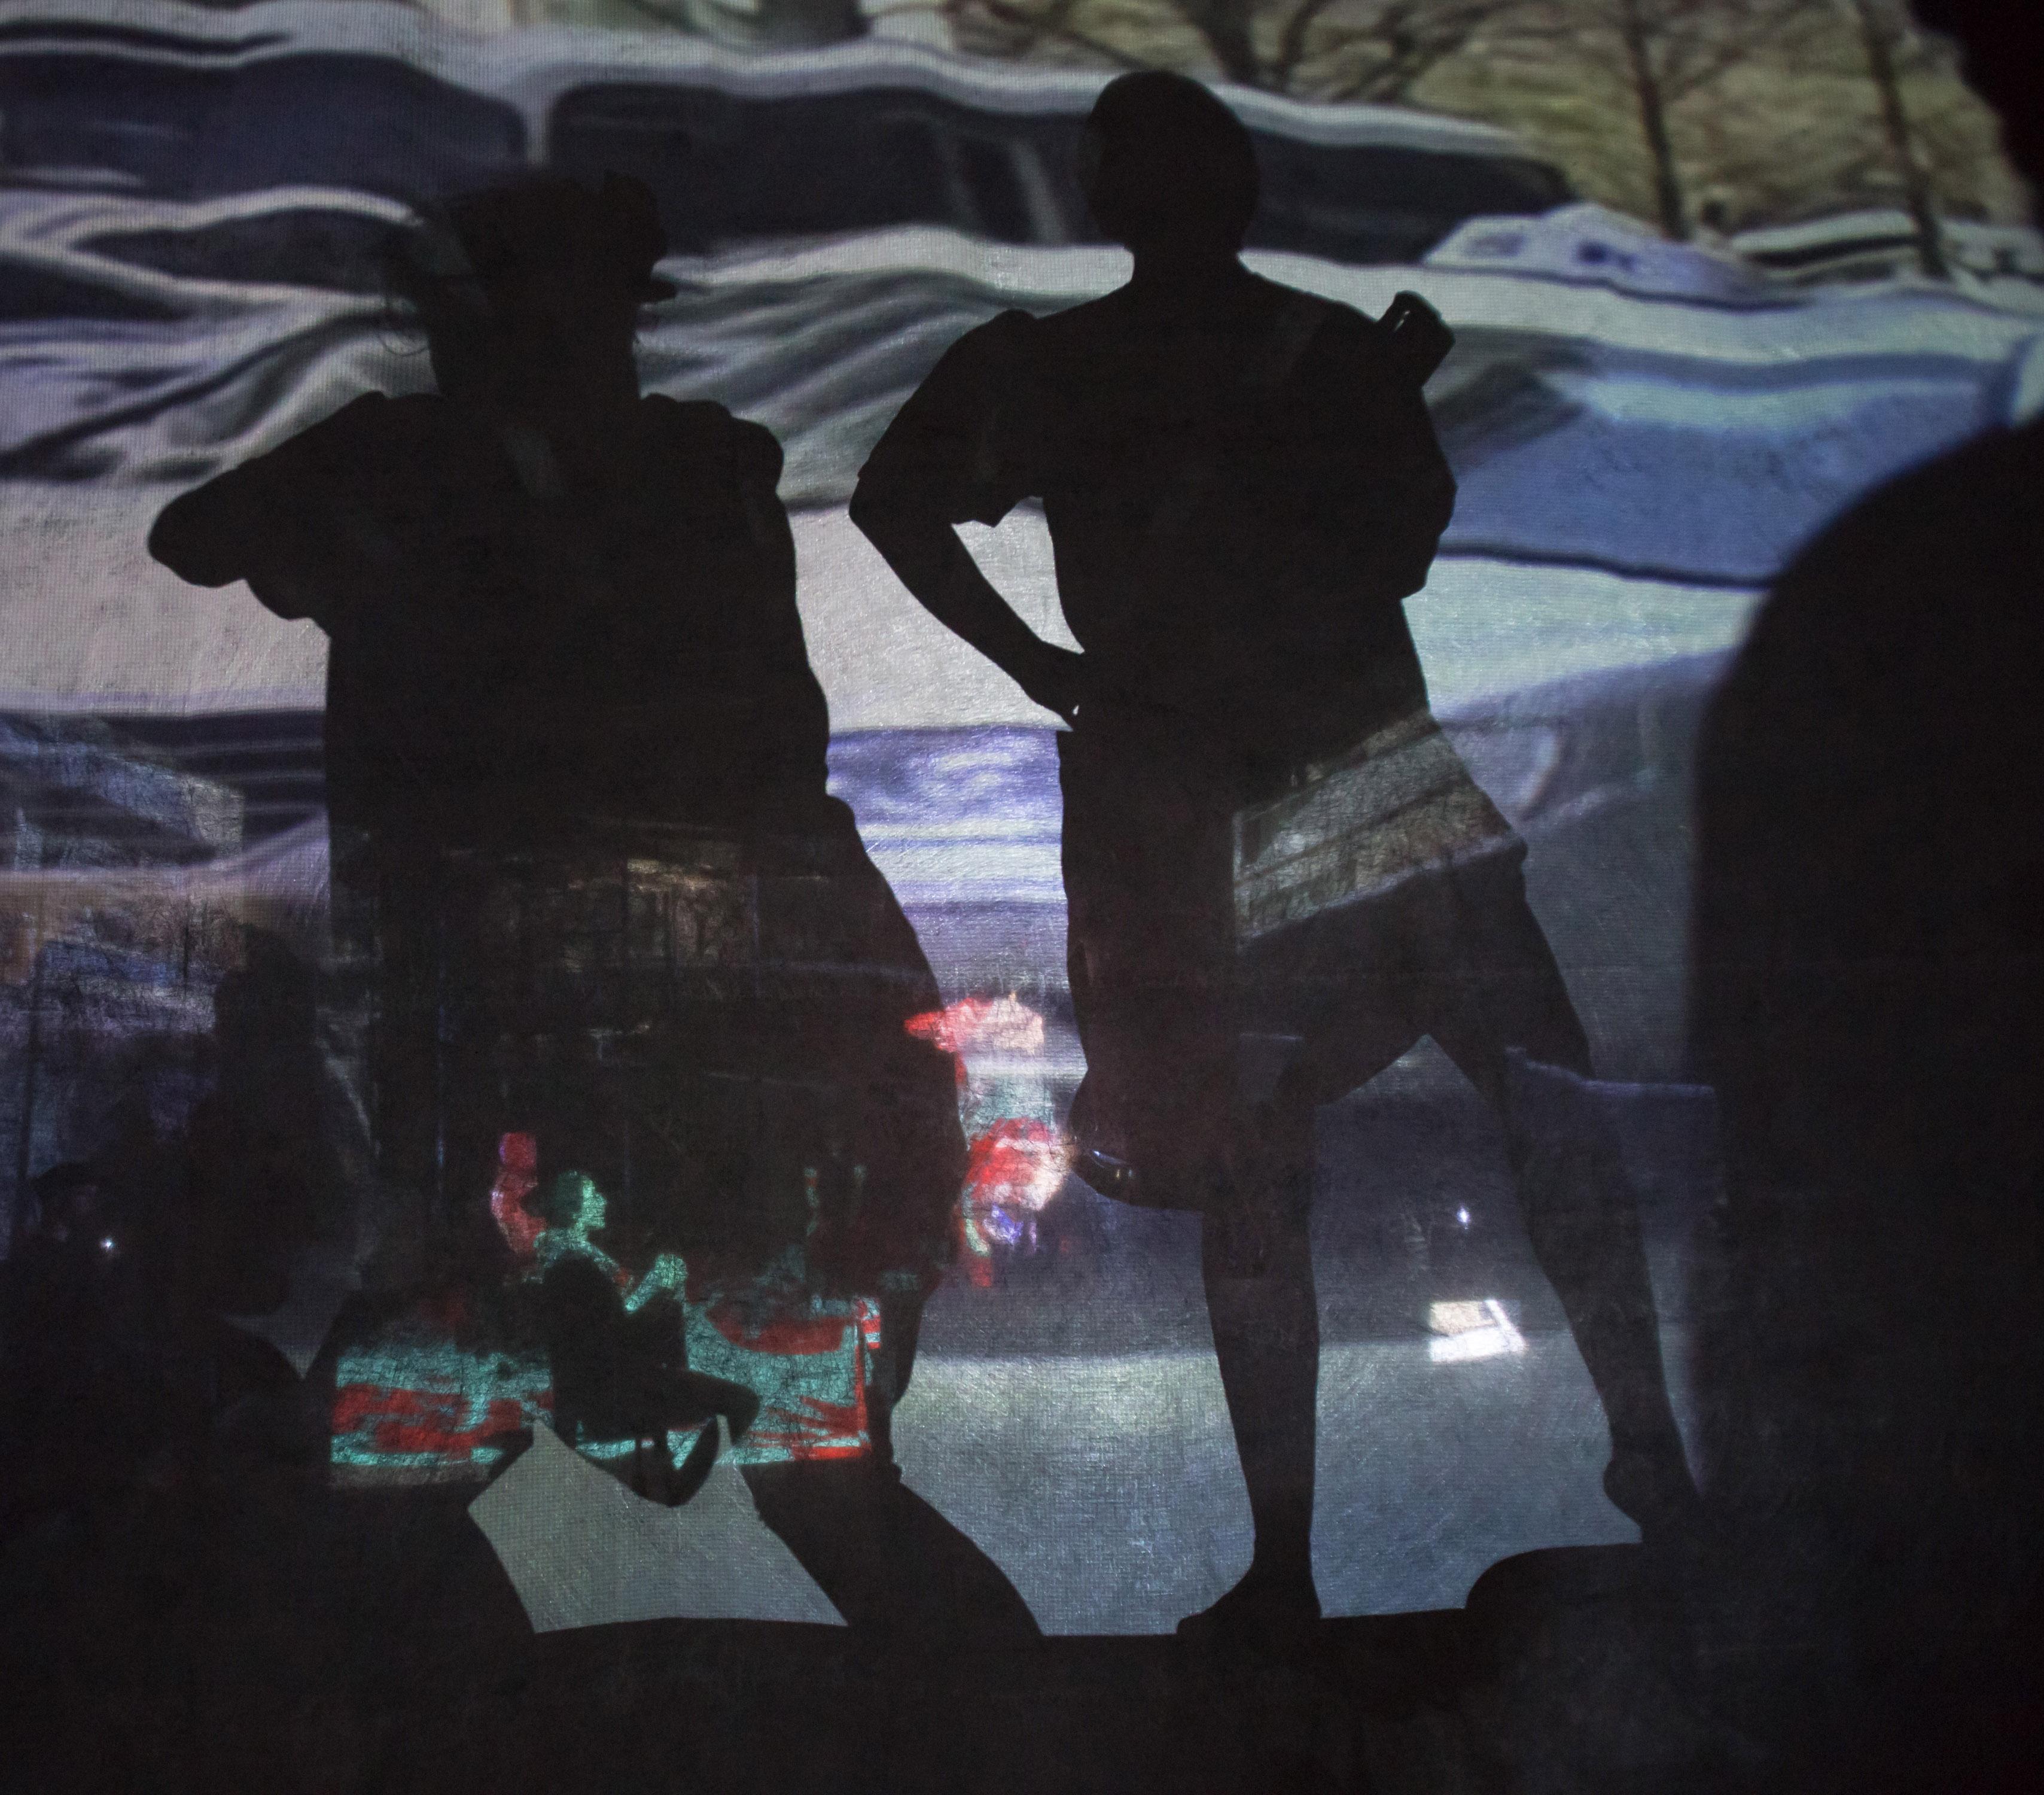 Projections by Dean Mullin in SPURT OF BLOOD (Photo: Dean Mullin)